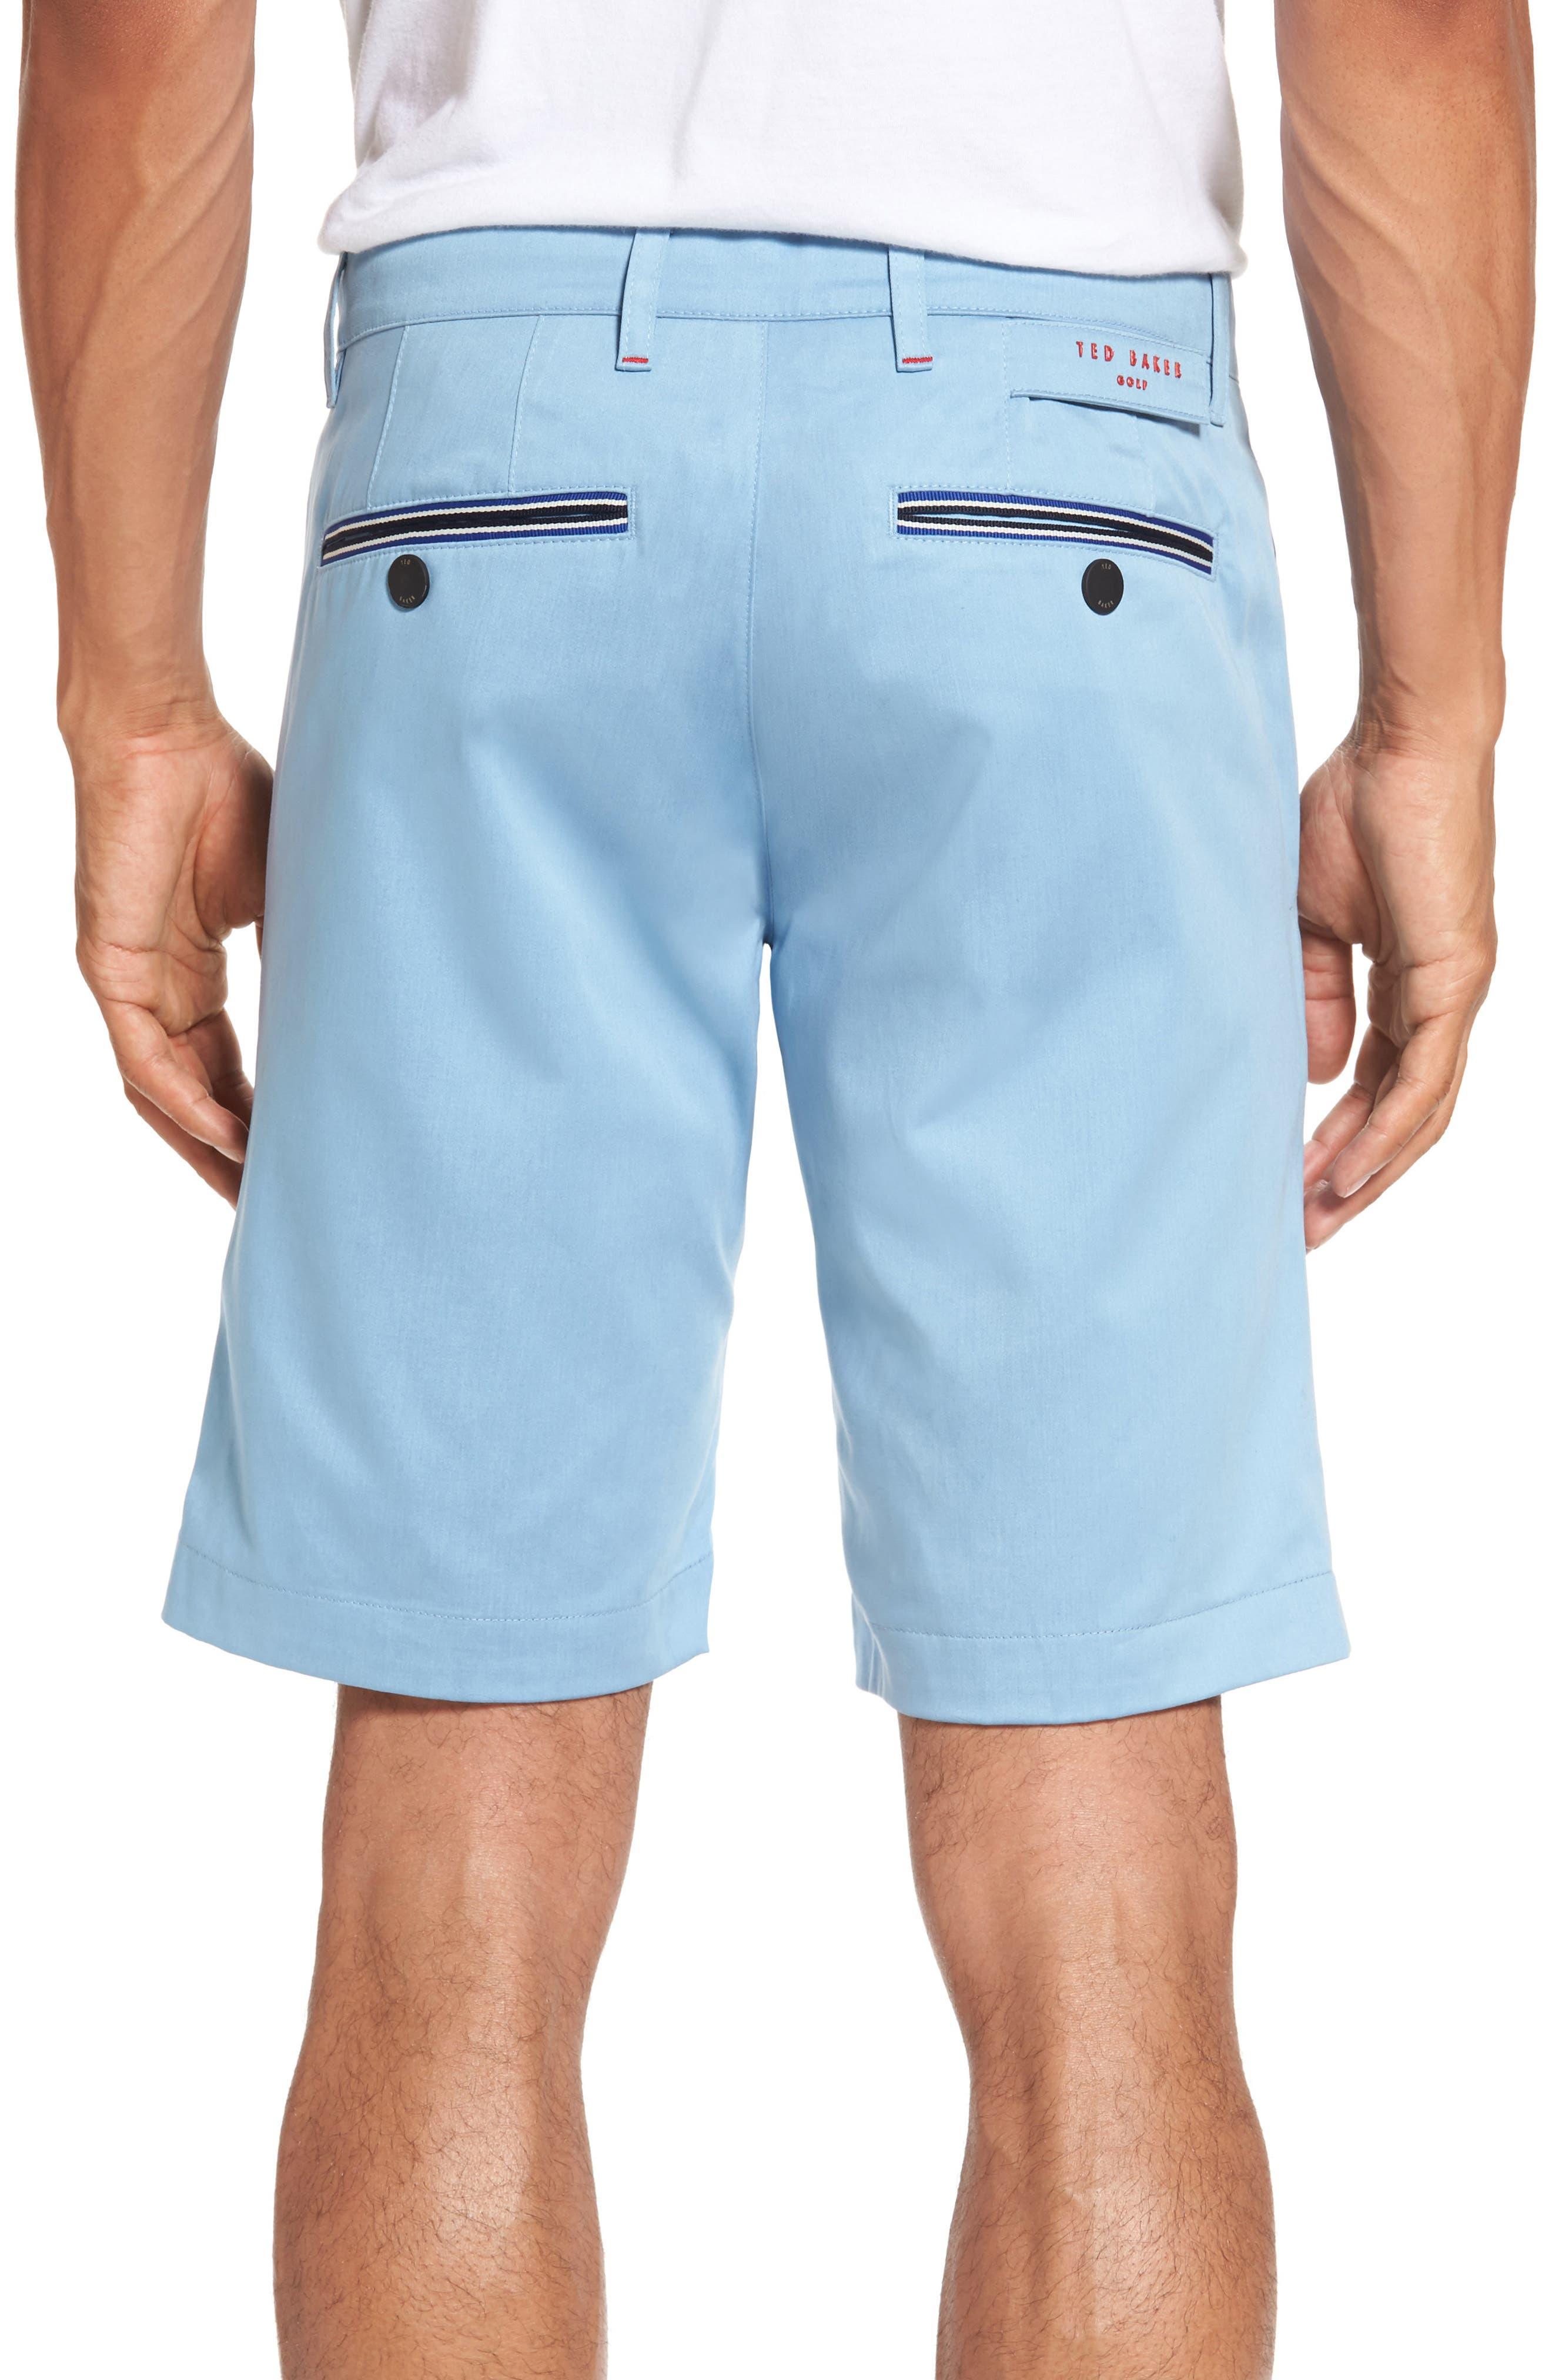 Alternate Image 2  - Ted Baker London Golf Shorts